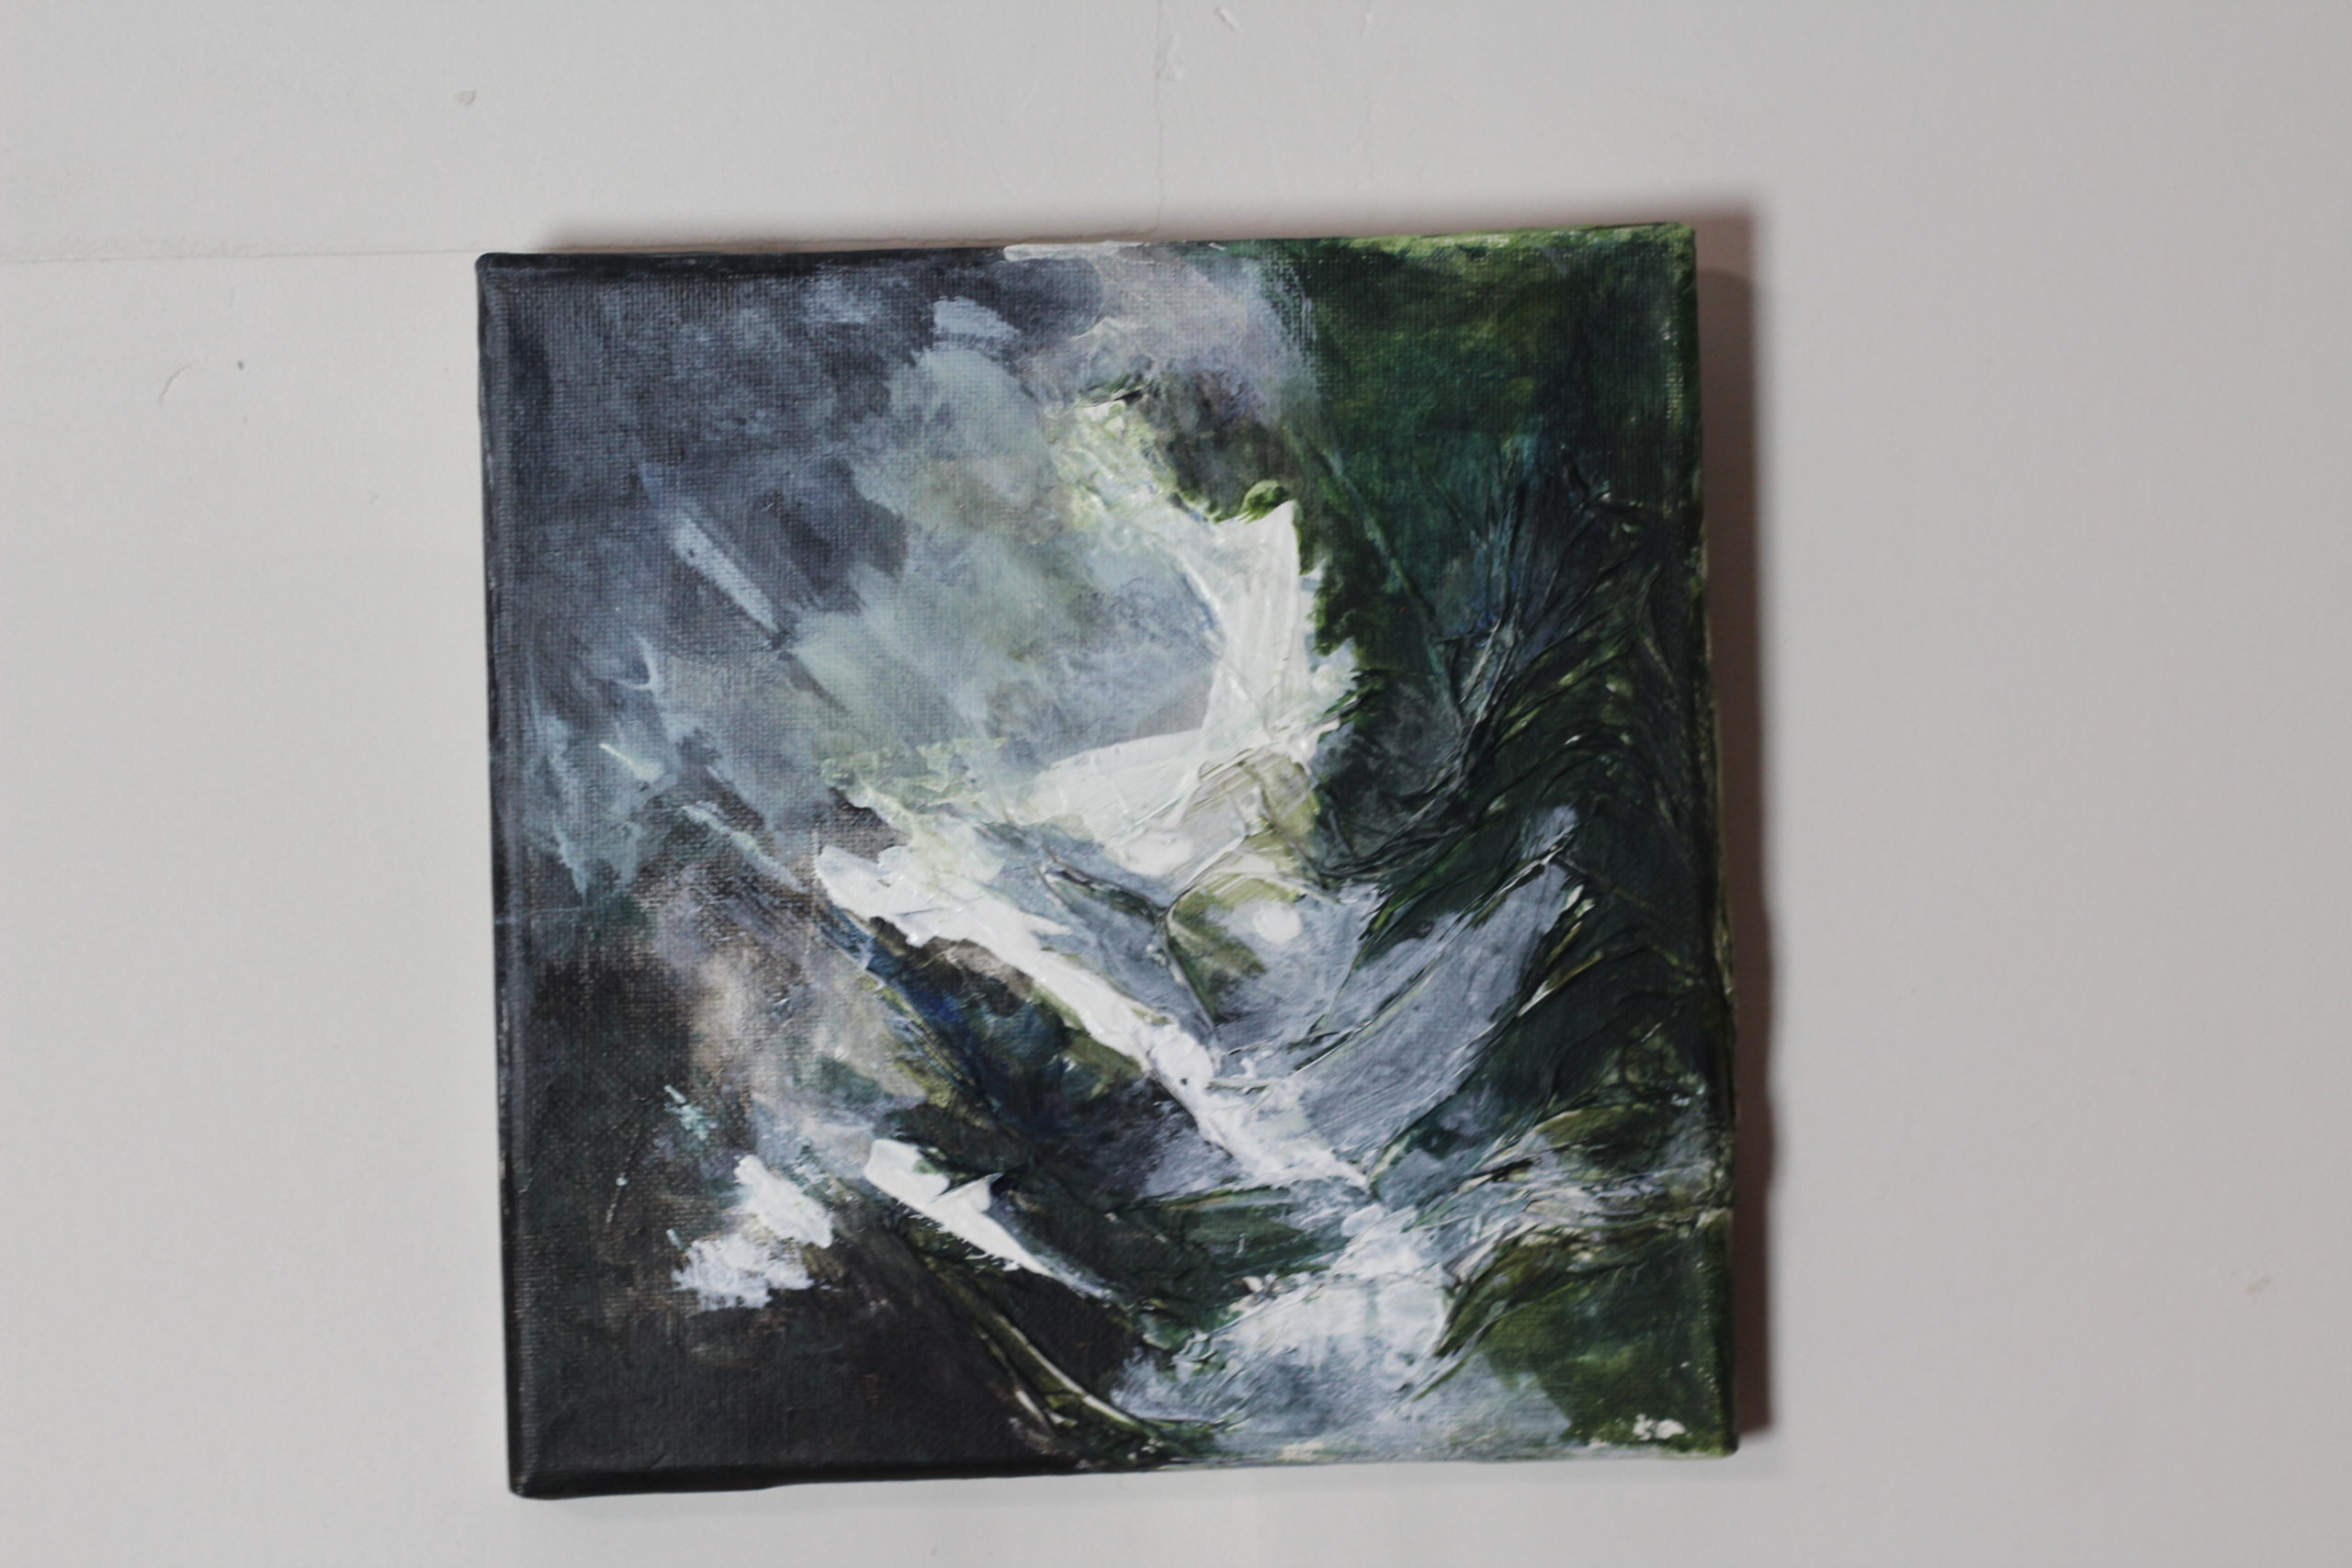 Peinture : Nature 6 20x20 (Véronique Fuchs-Sublon)